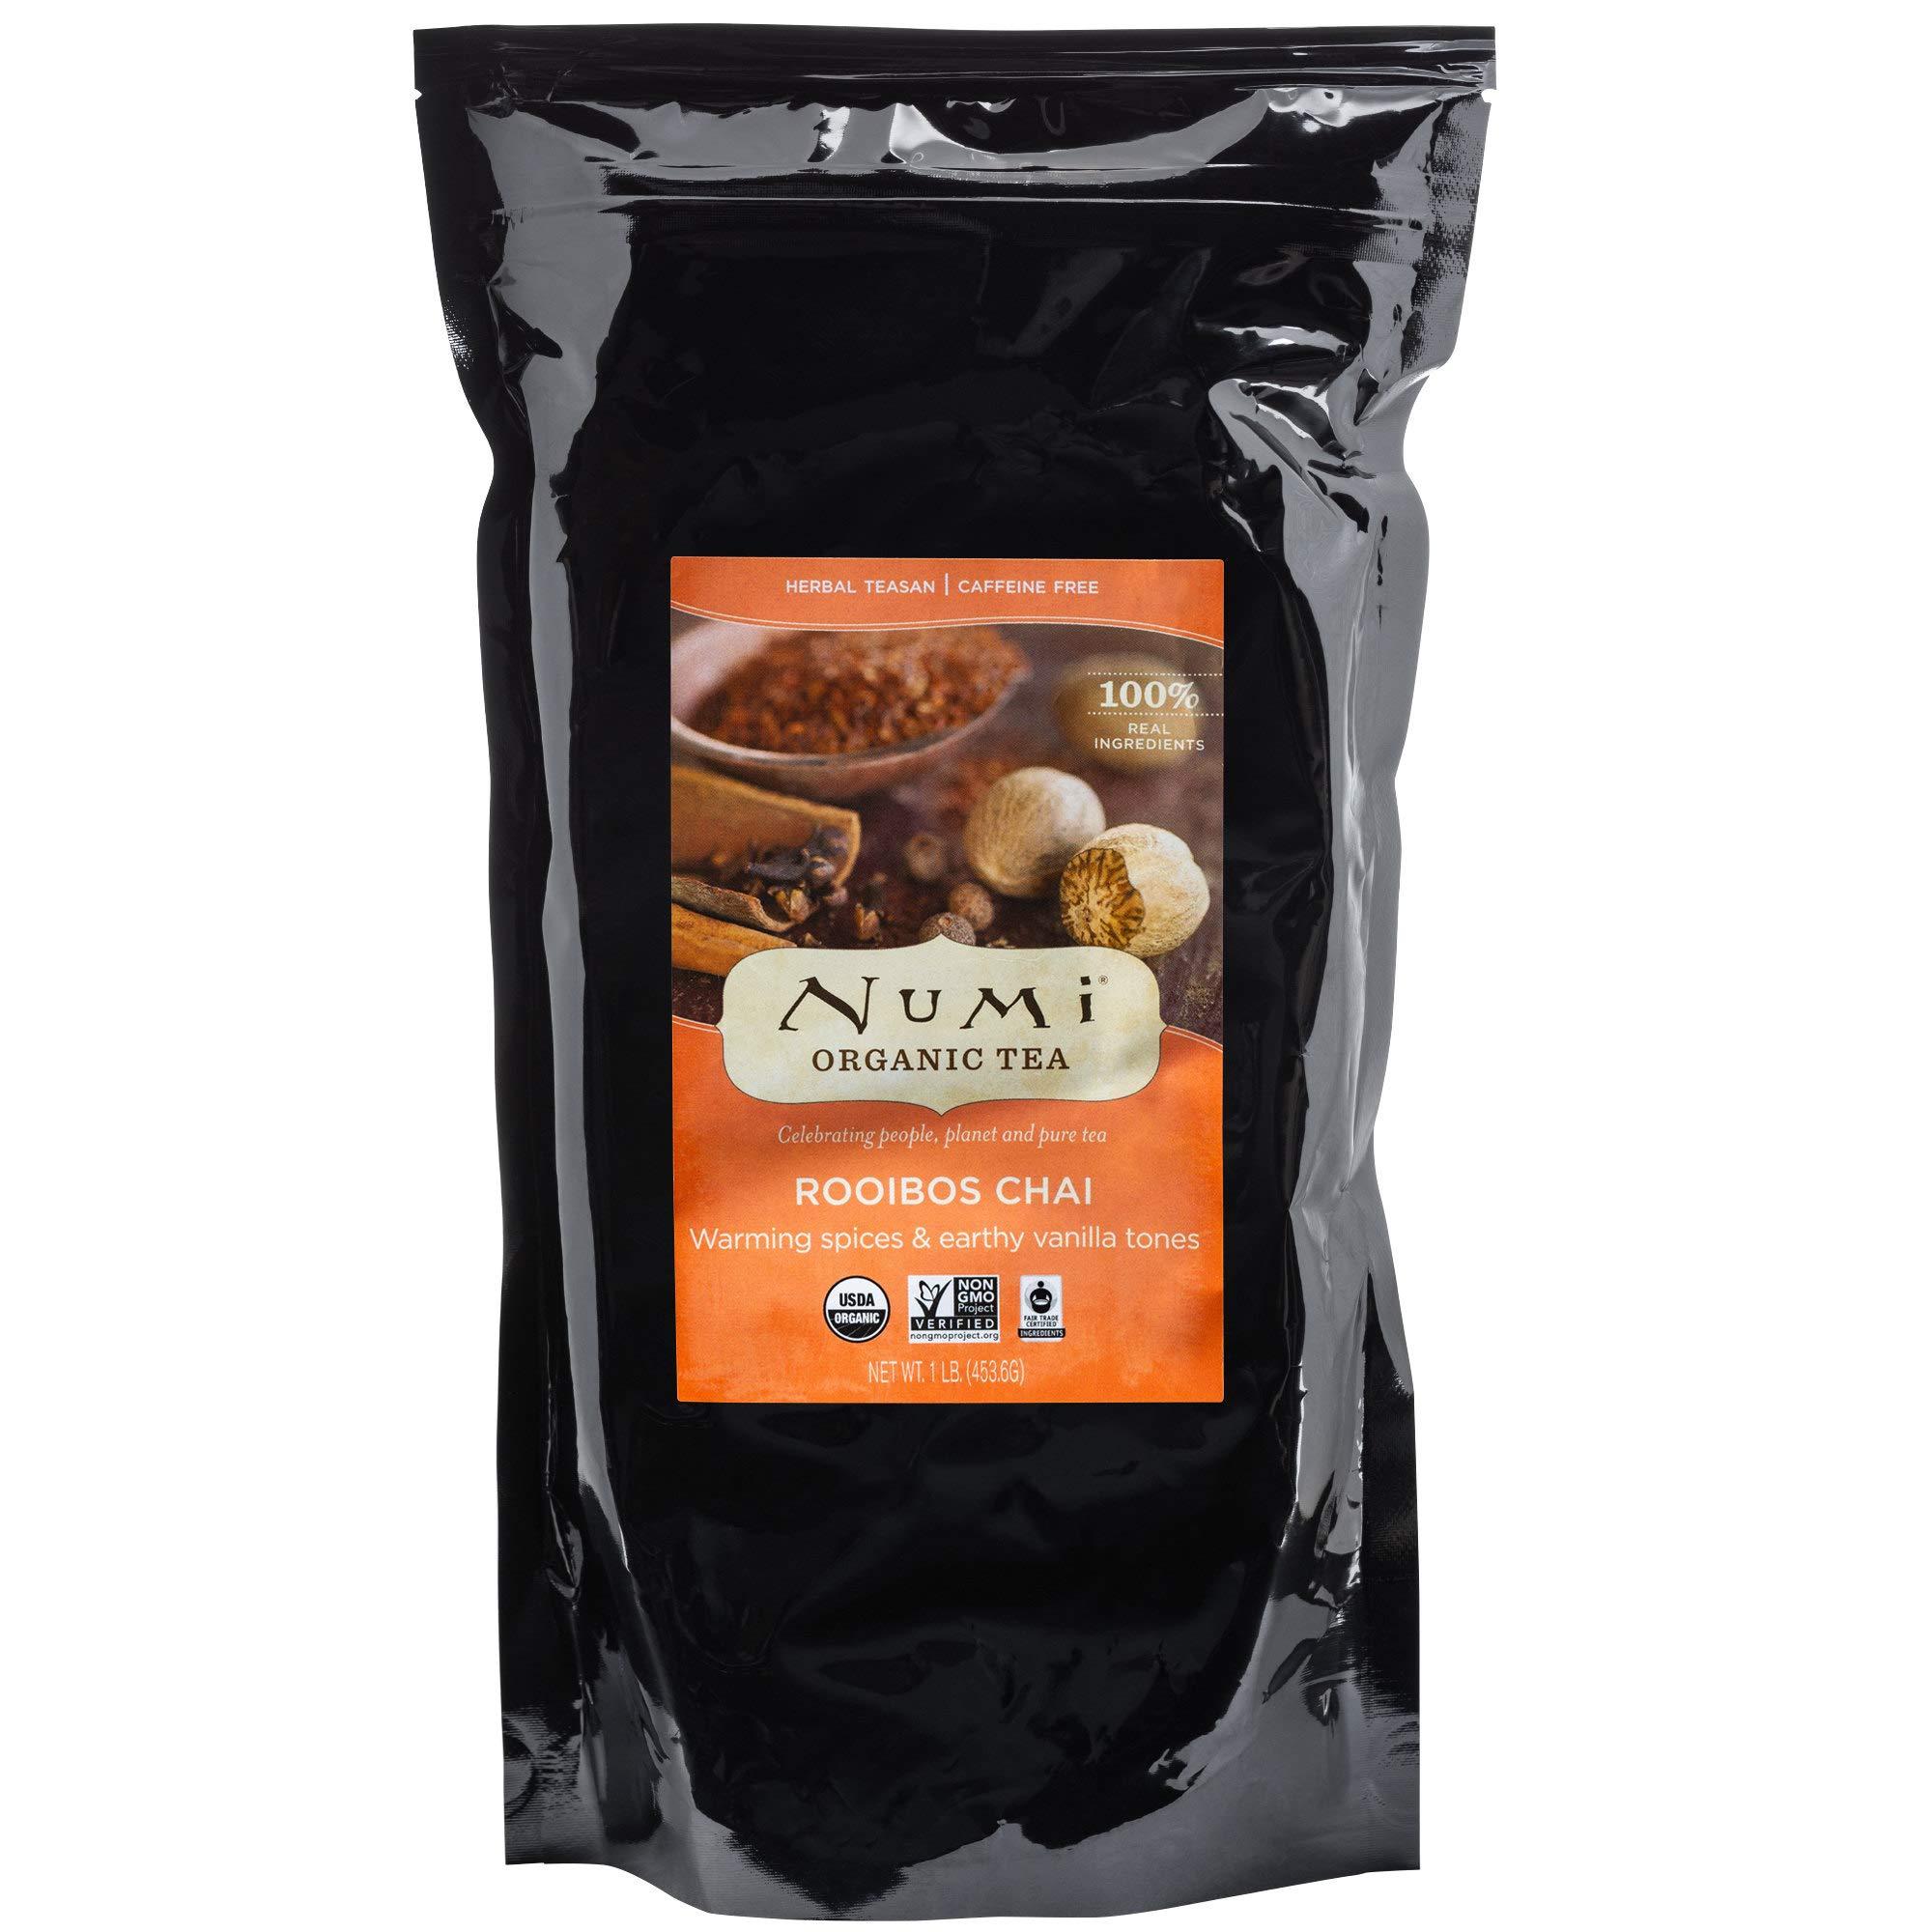 TableTop King Organic Rooibos Chai Loose Leaf Tea 1 lb. Bag